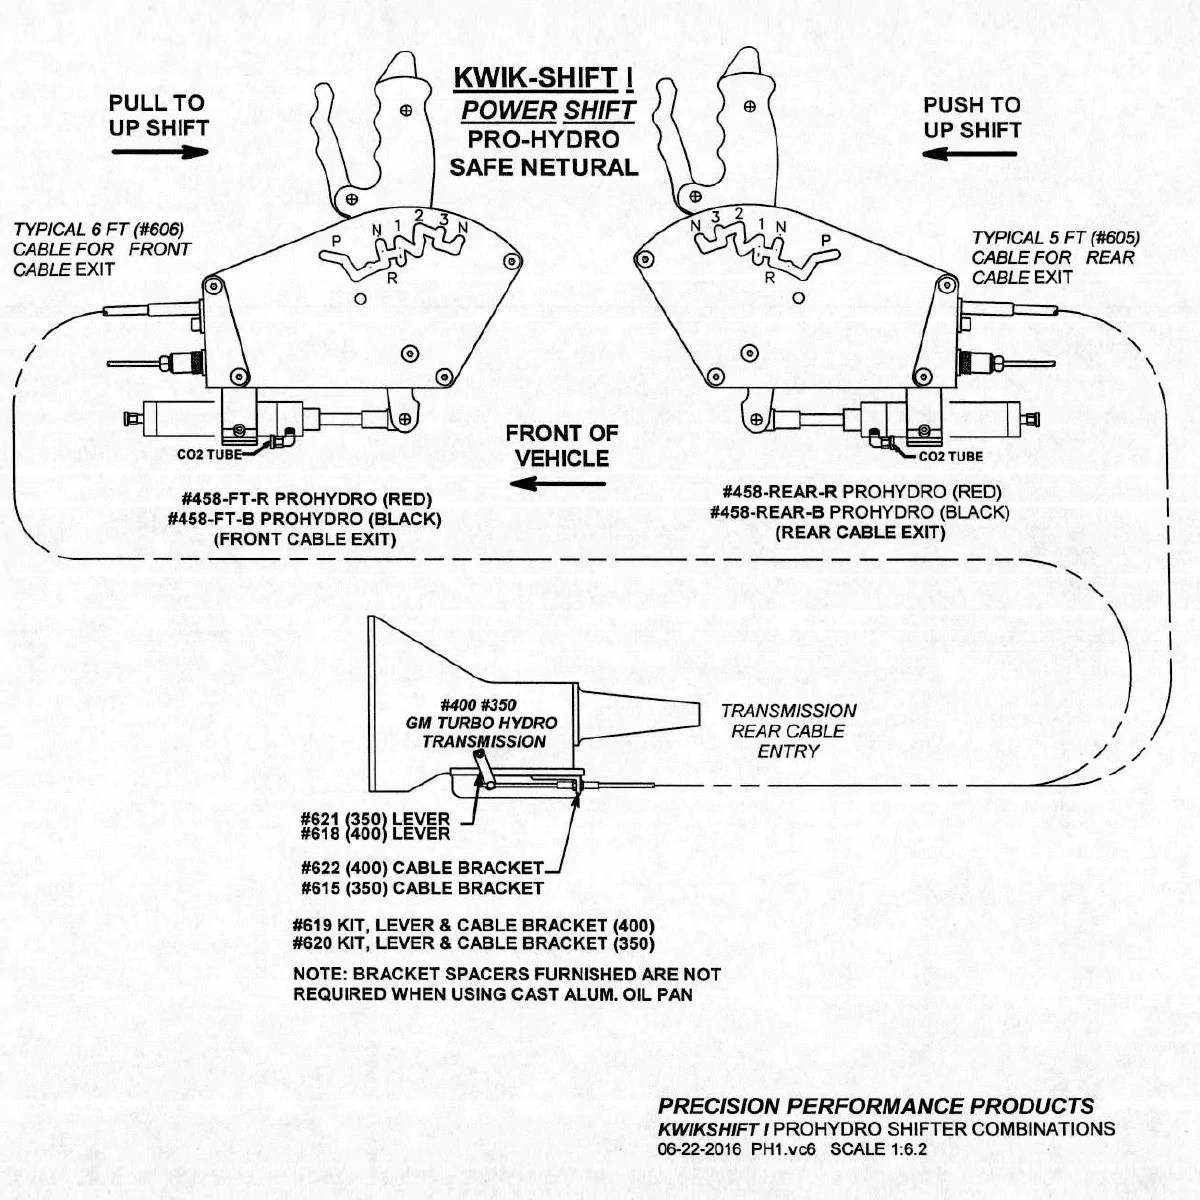 medium resolution of turbo 400 transmission wiring diagram wiring diagram todays 200r4 wiring diagram 85 chevy 400 transmission